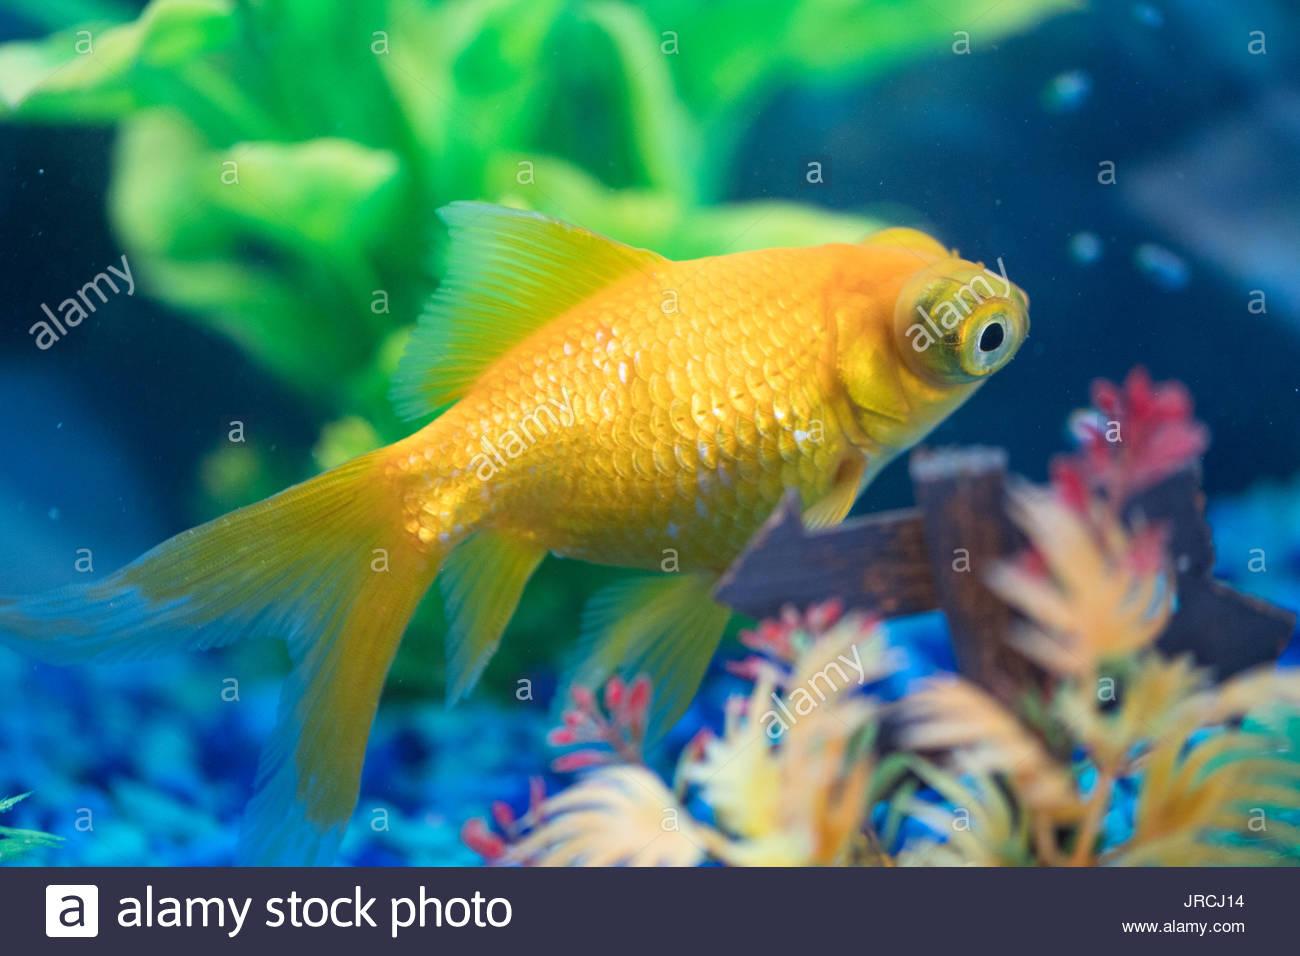 Dragon Goldfish Stock Photos & Dragon Goldfish Stock Images - Alamy